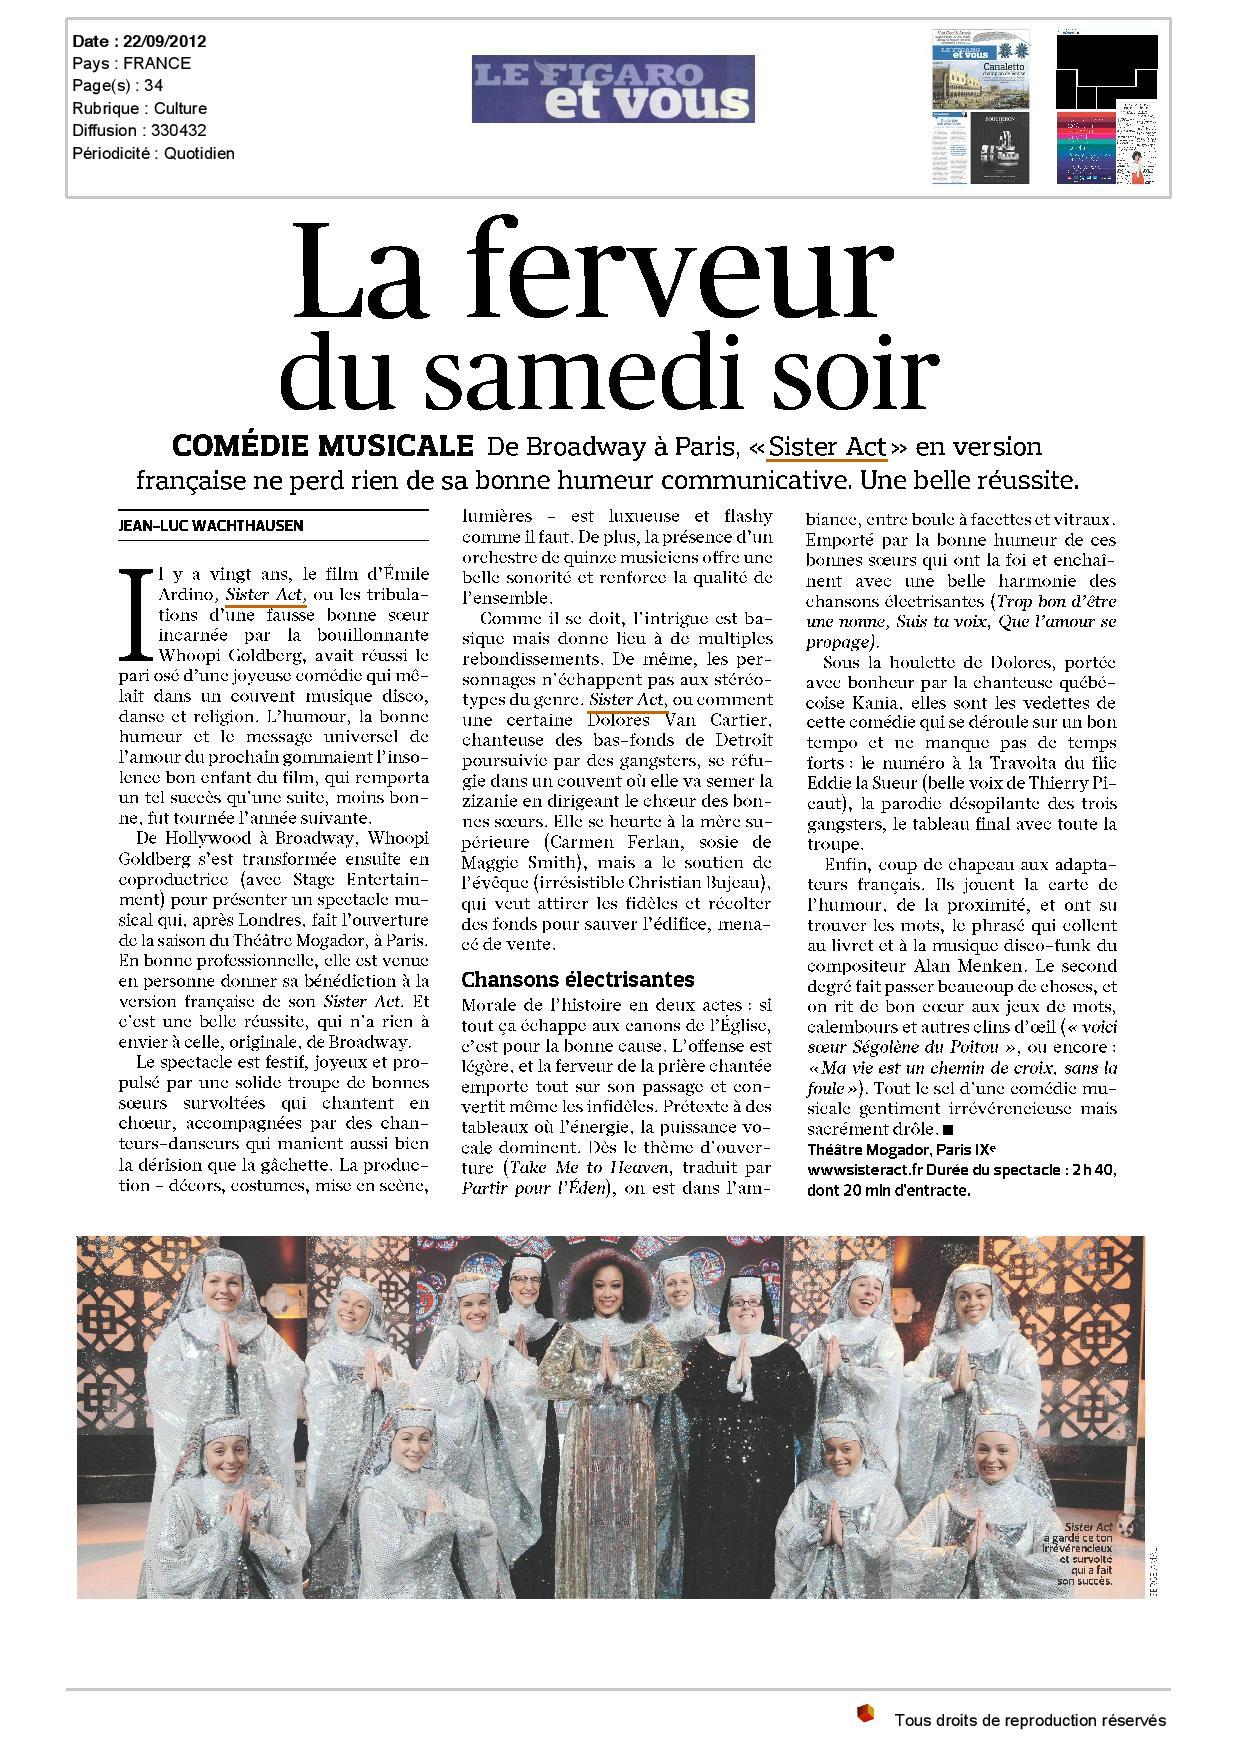 presse_Le Figaro_et_vous - Sister Act Le Musical